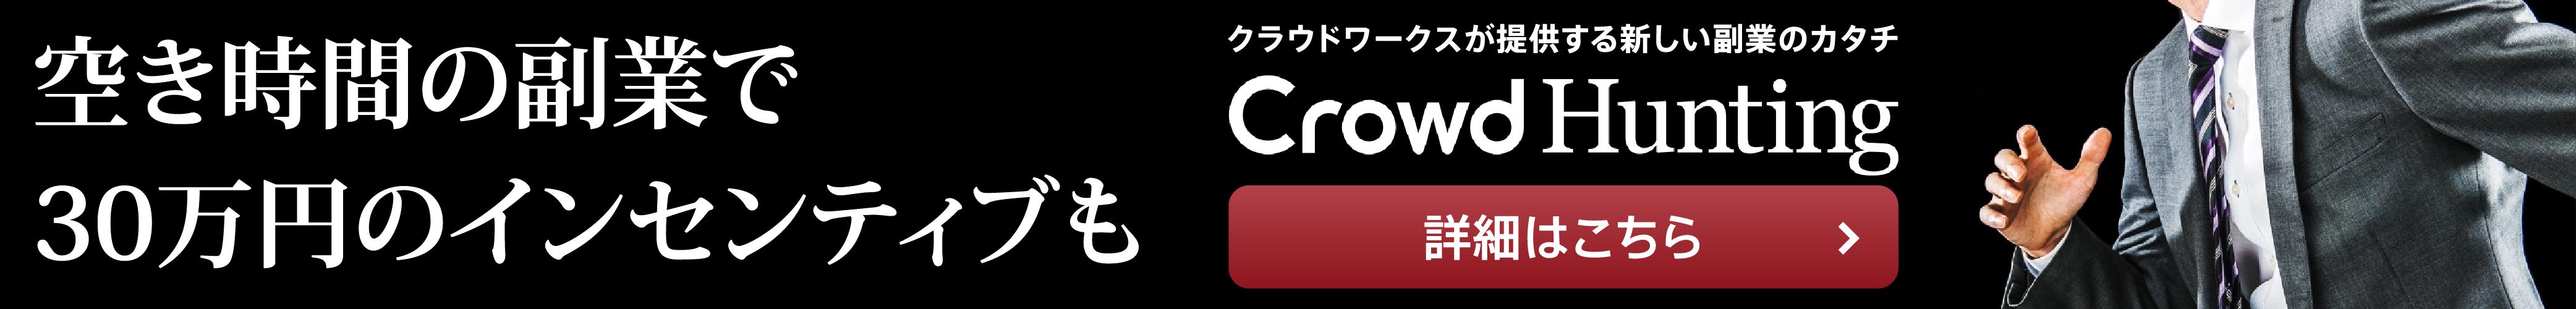 Crowdhunting w1000